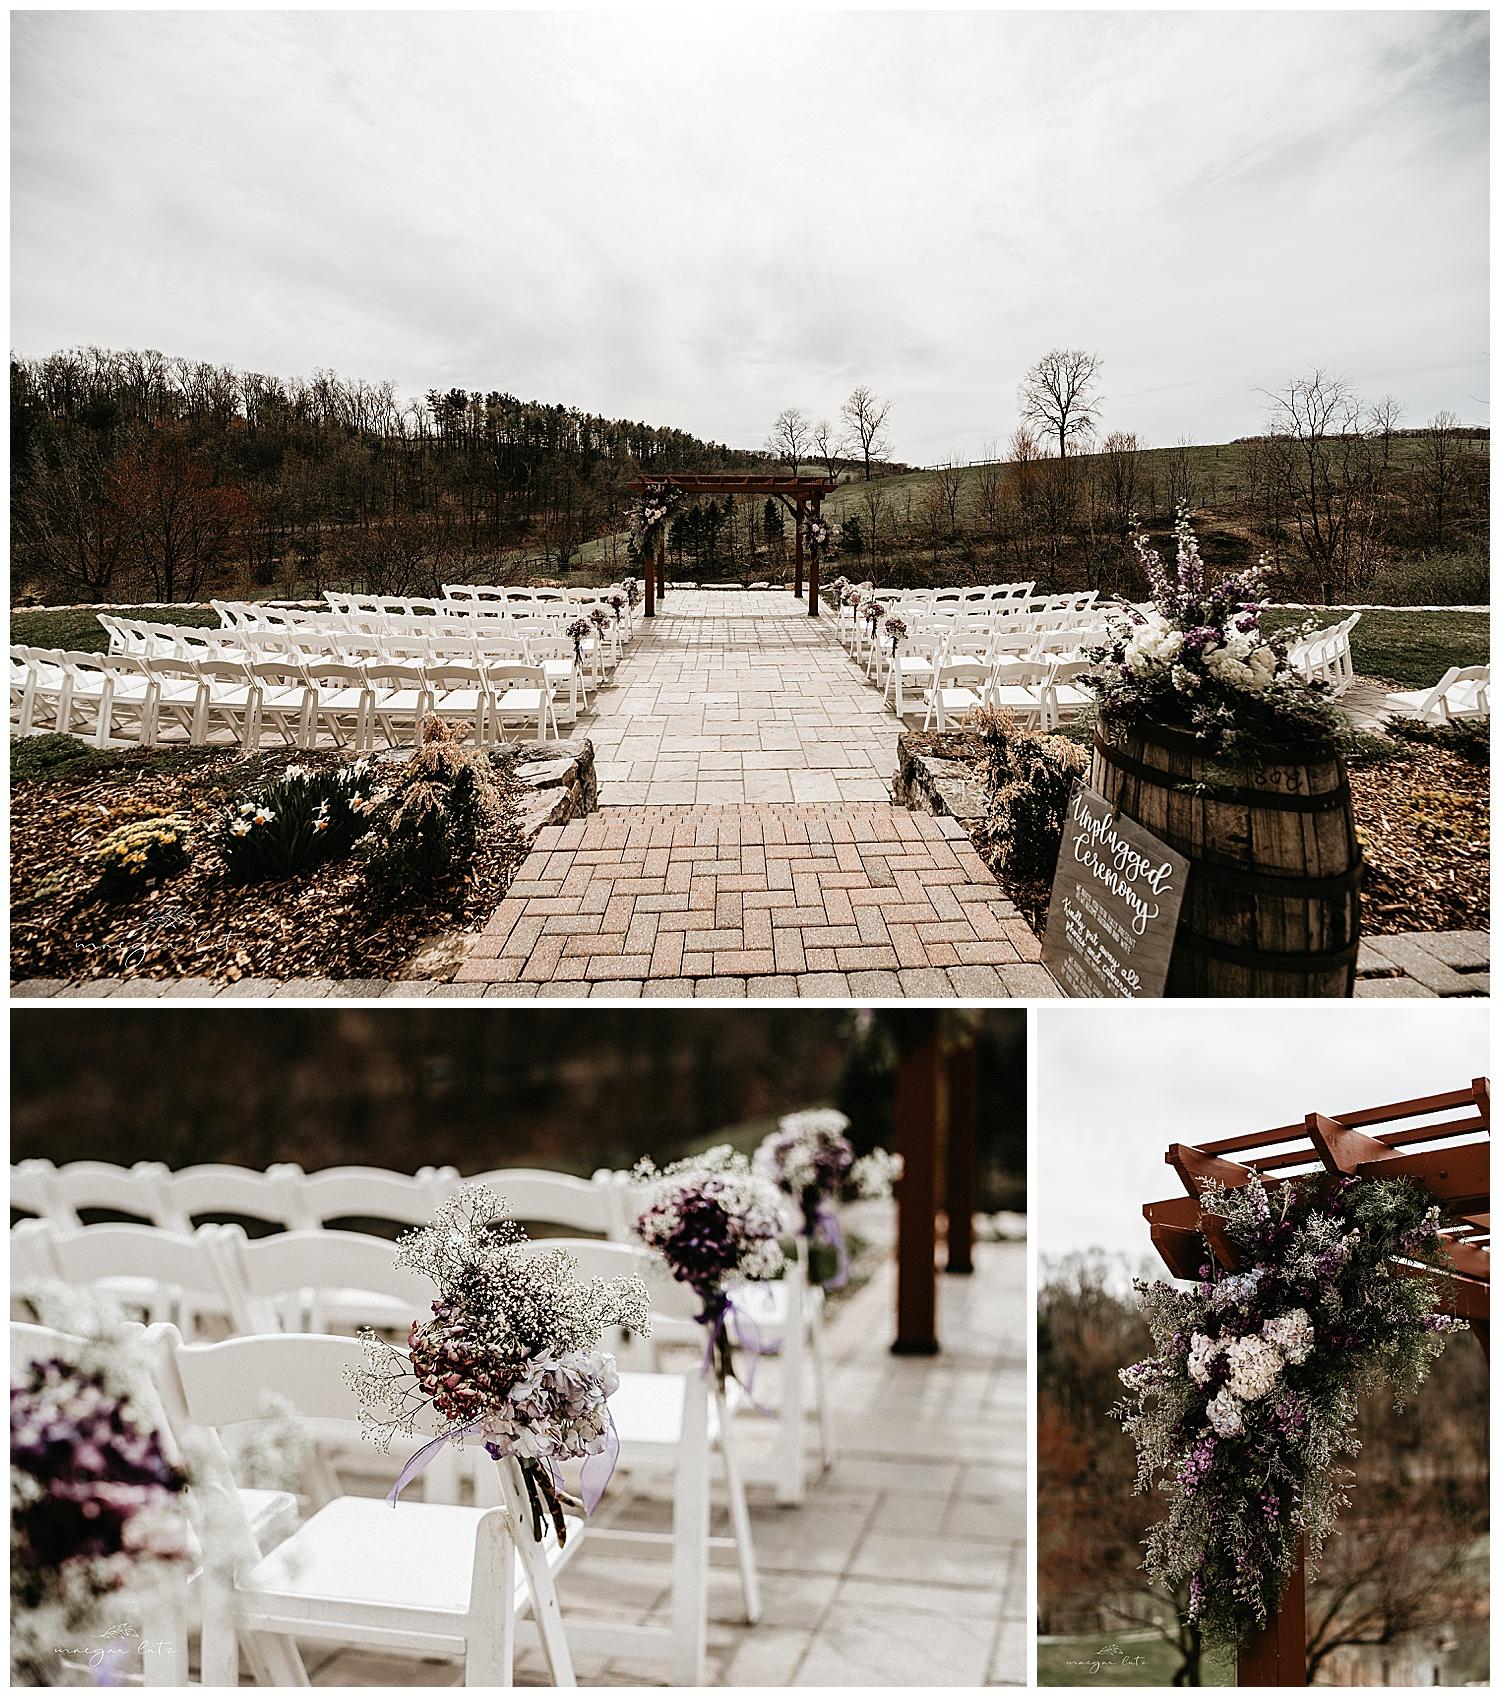 NEPA-wedding-photographer-at-the-glasbern-inn-fogelsvilles-pa_0012.jpg